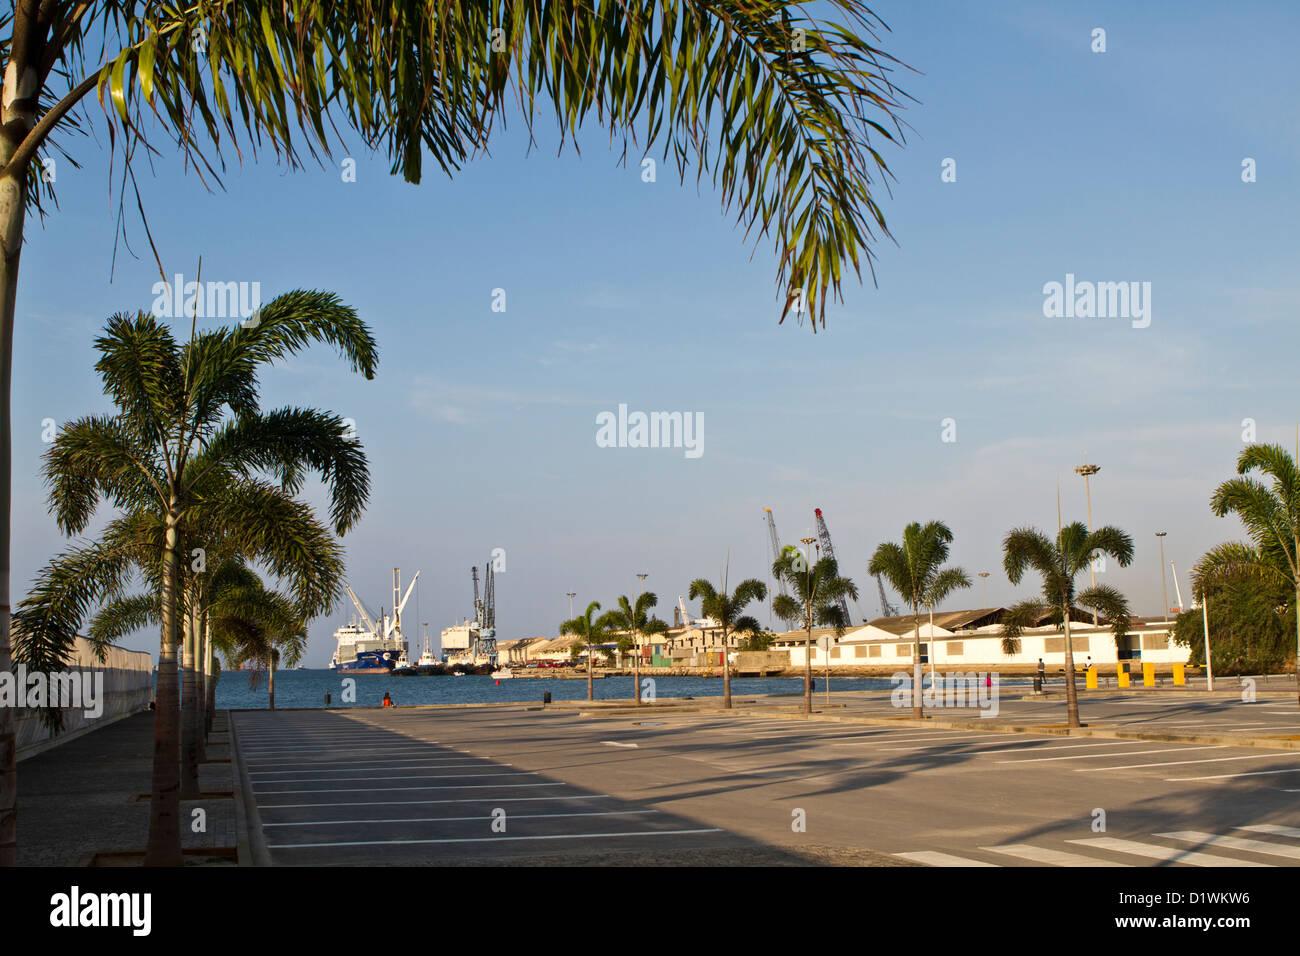 Luanda harbor, Angola - Stock Image